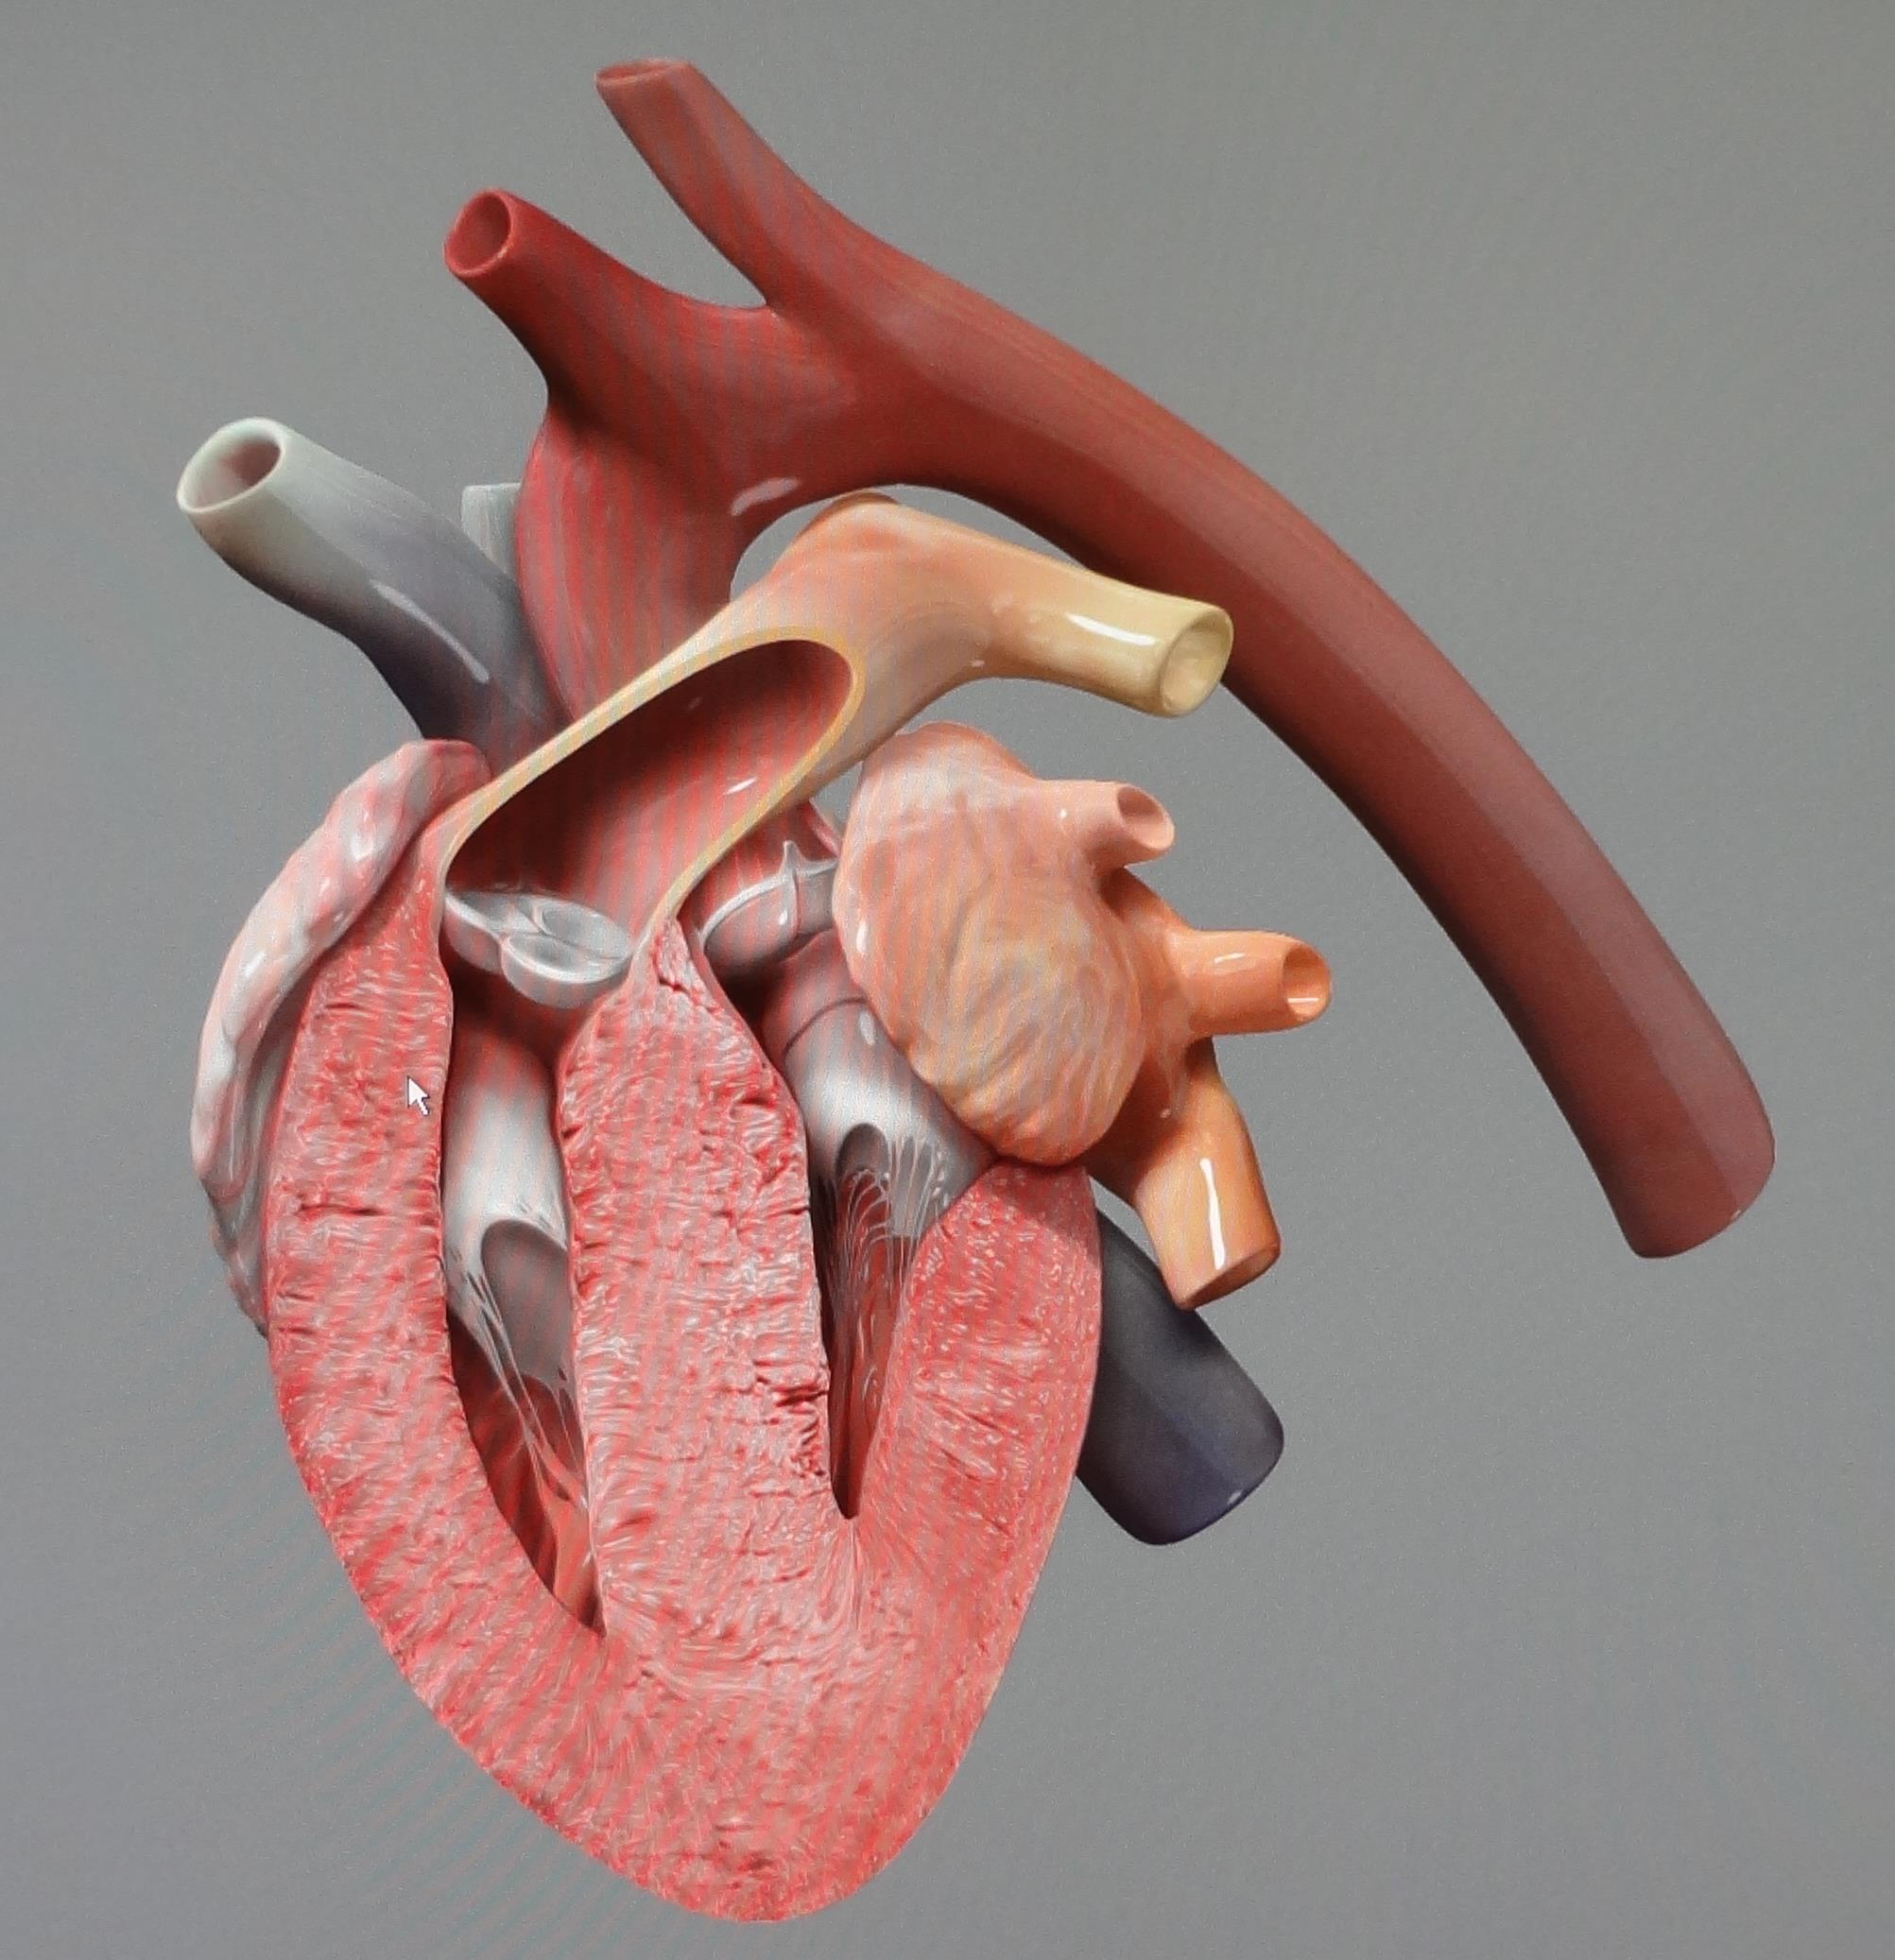 TVRH triangle veterinary referral hospital trianglevrh Hypertrophic cardiomyopathy.JPG